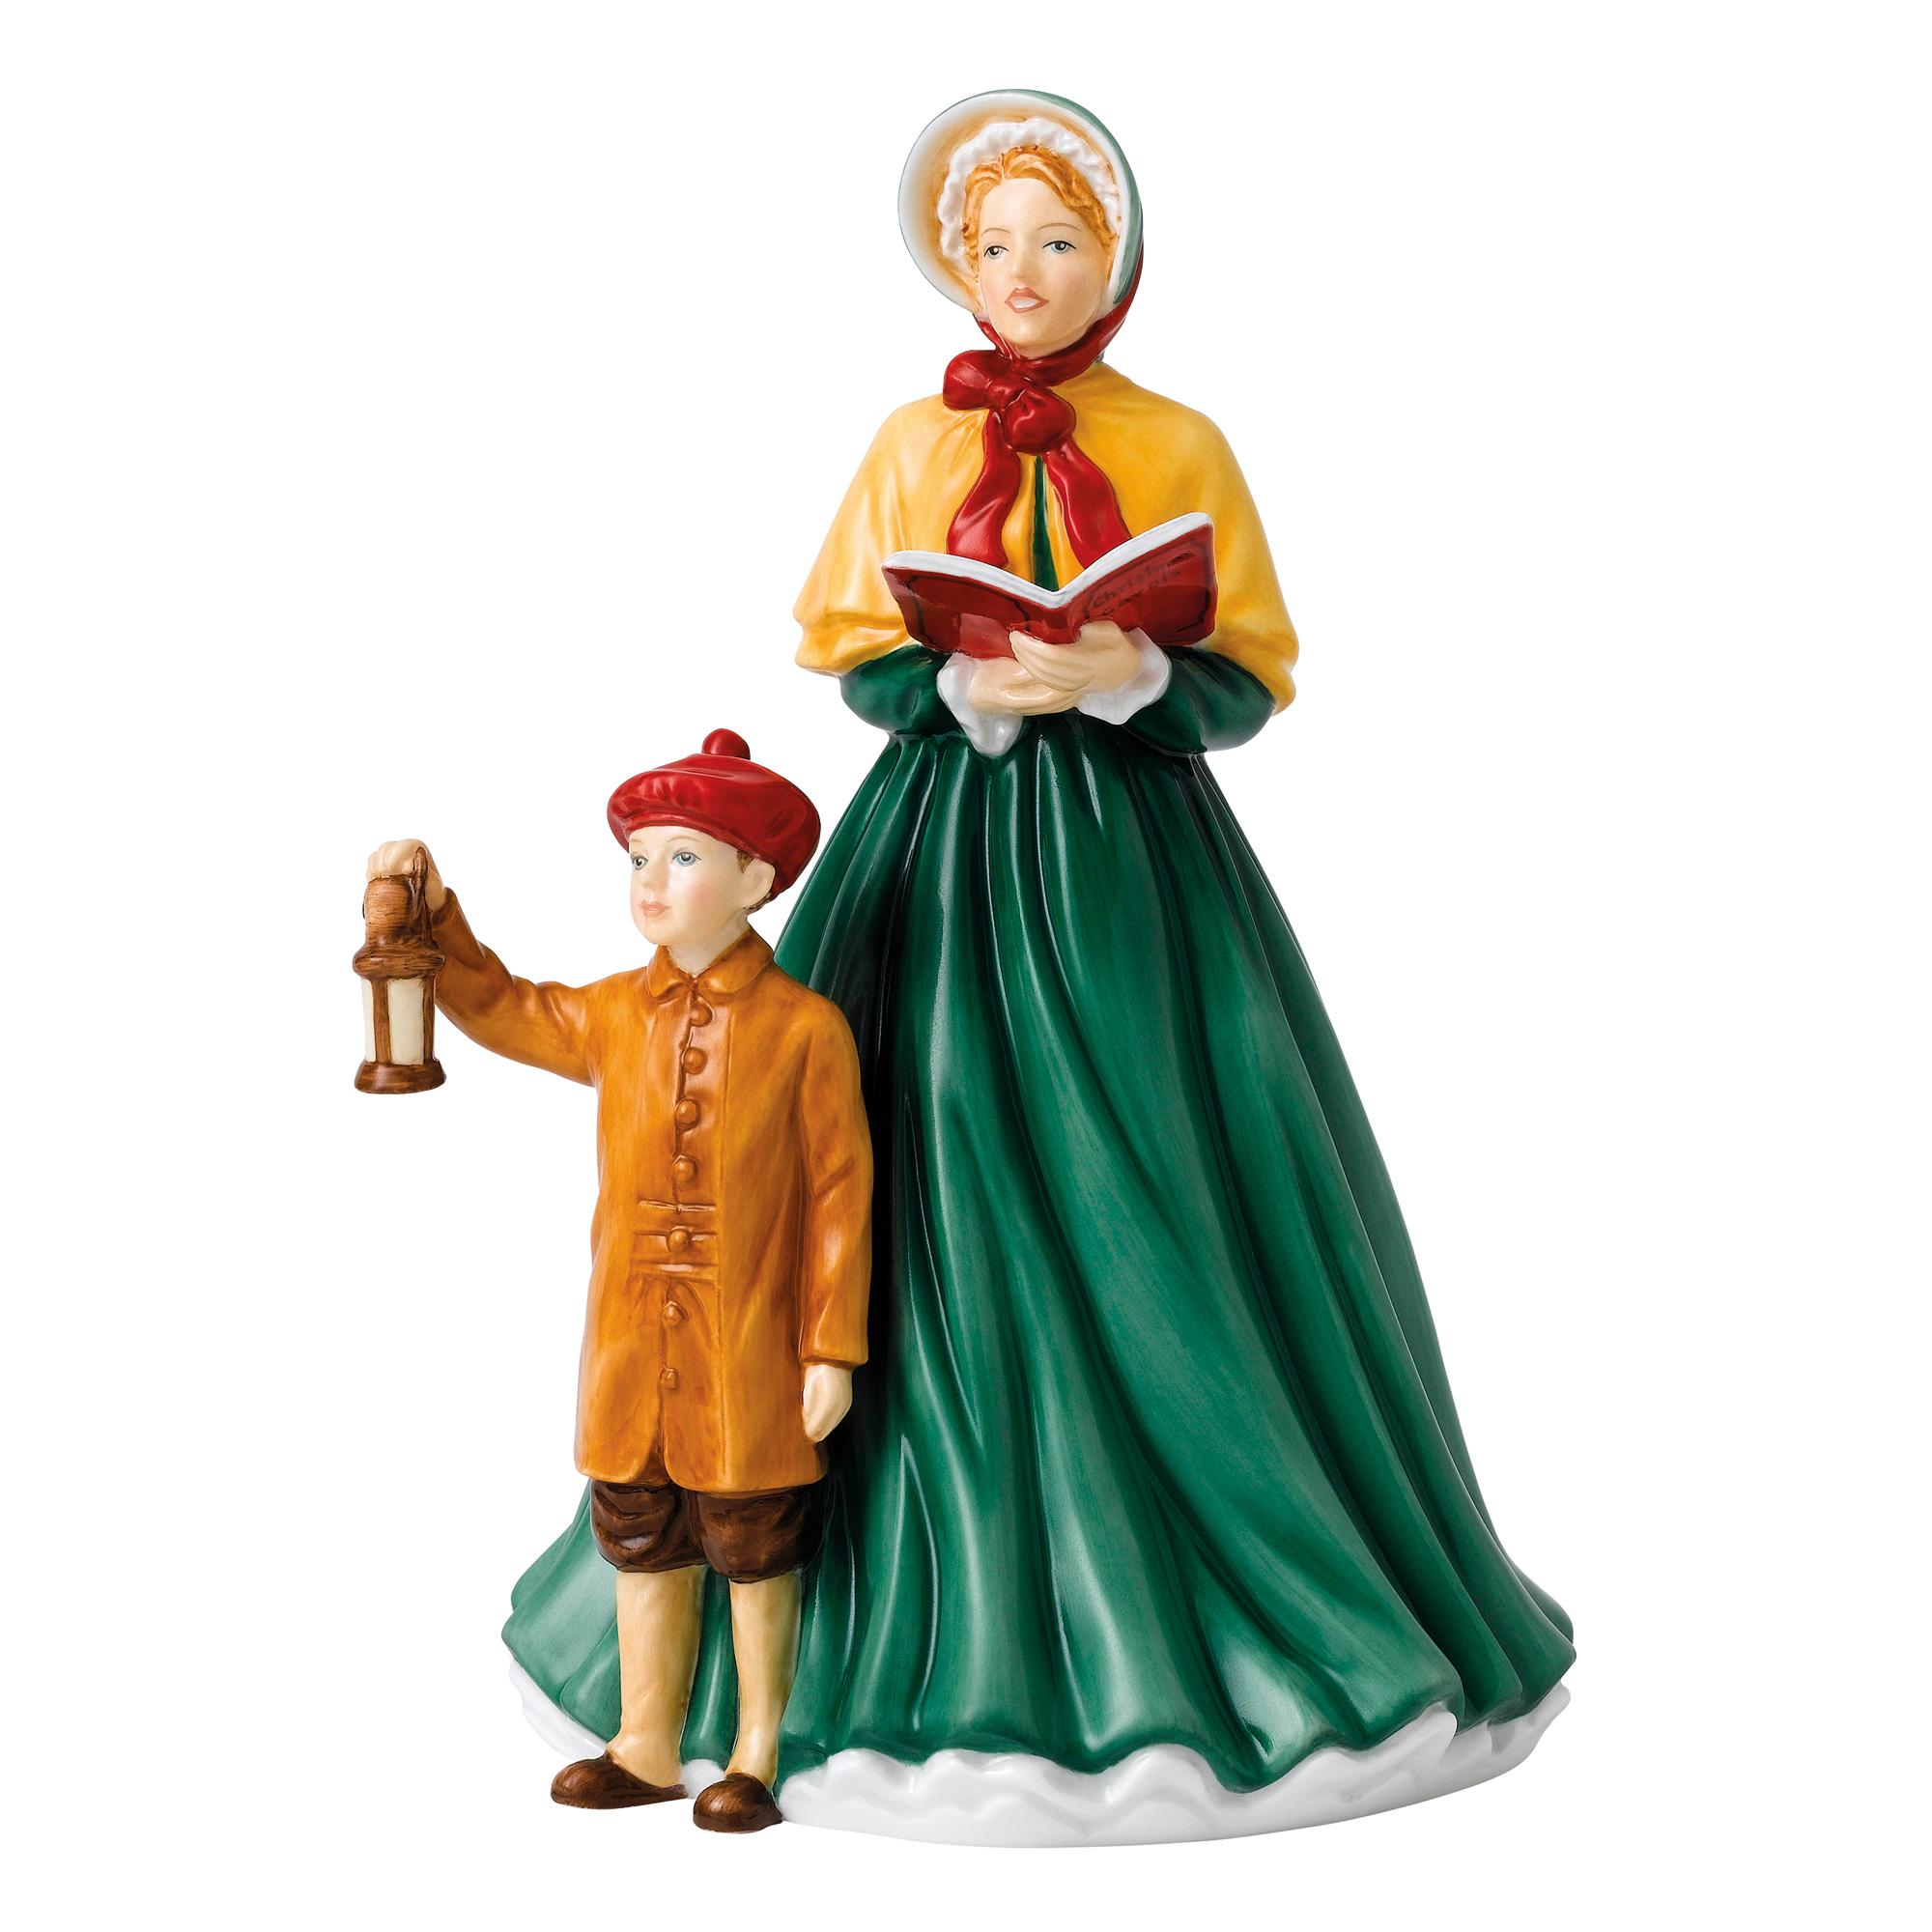 Christmas Carol Singers Figurines.Here We Come A Caroling Hn5888 Royal Doulton Figurine